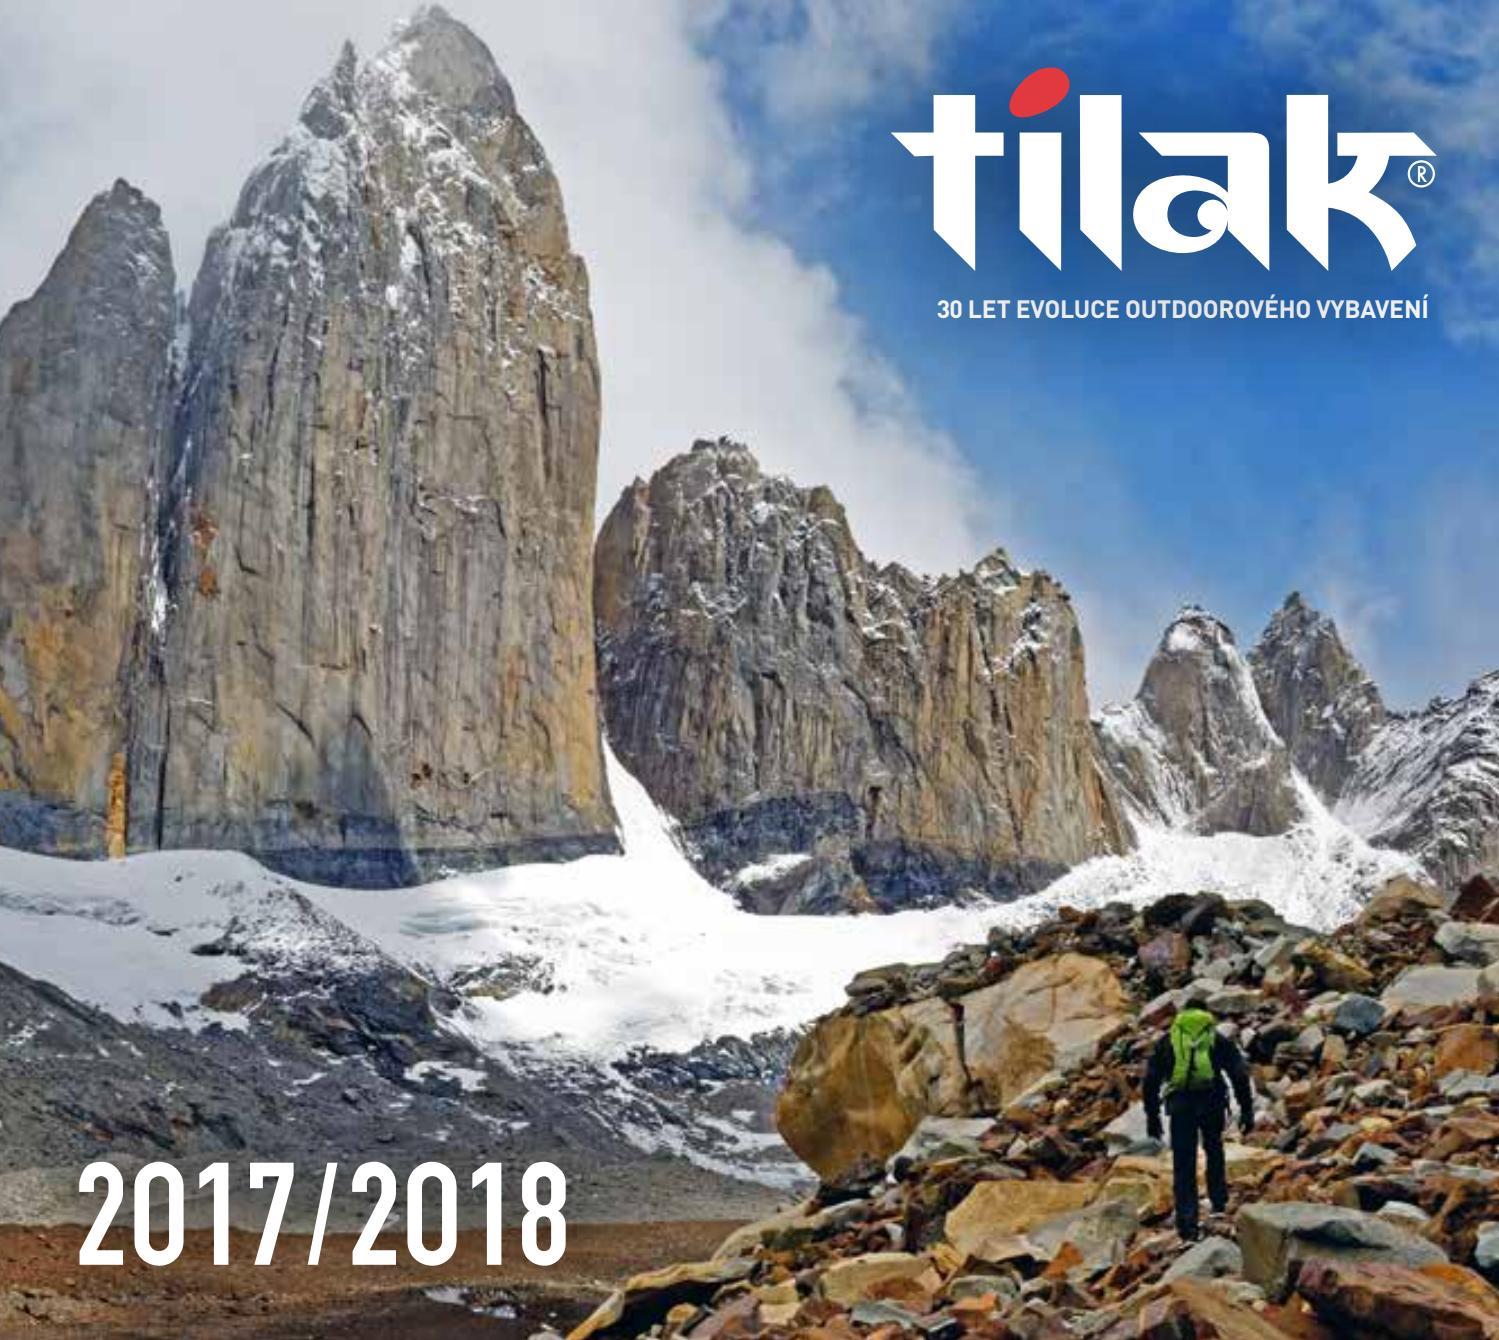 7d2ff03f0e9 Tilak katalog 2017 by Tilak - issuu